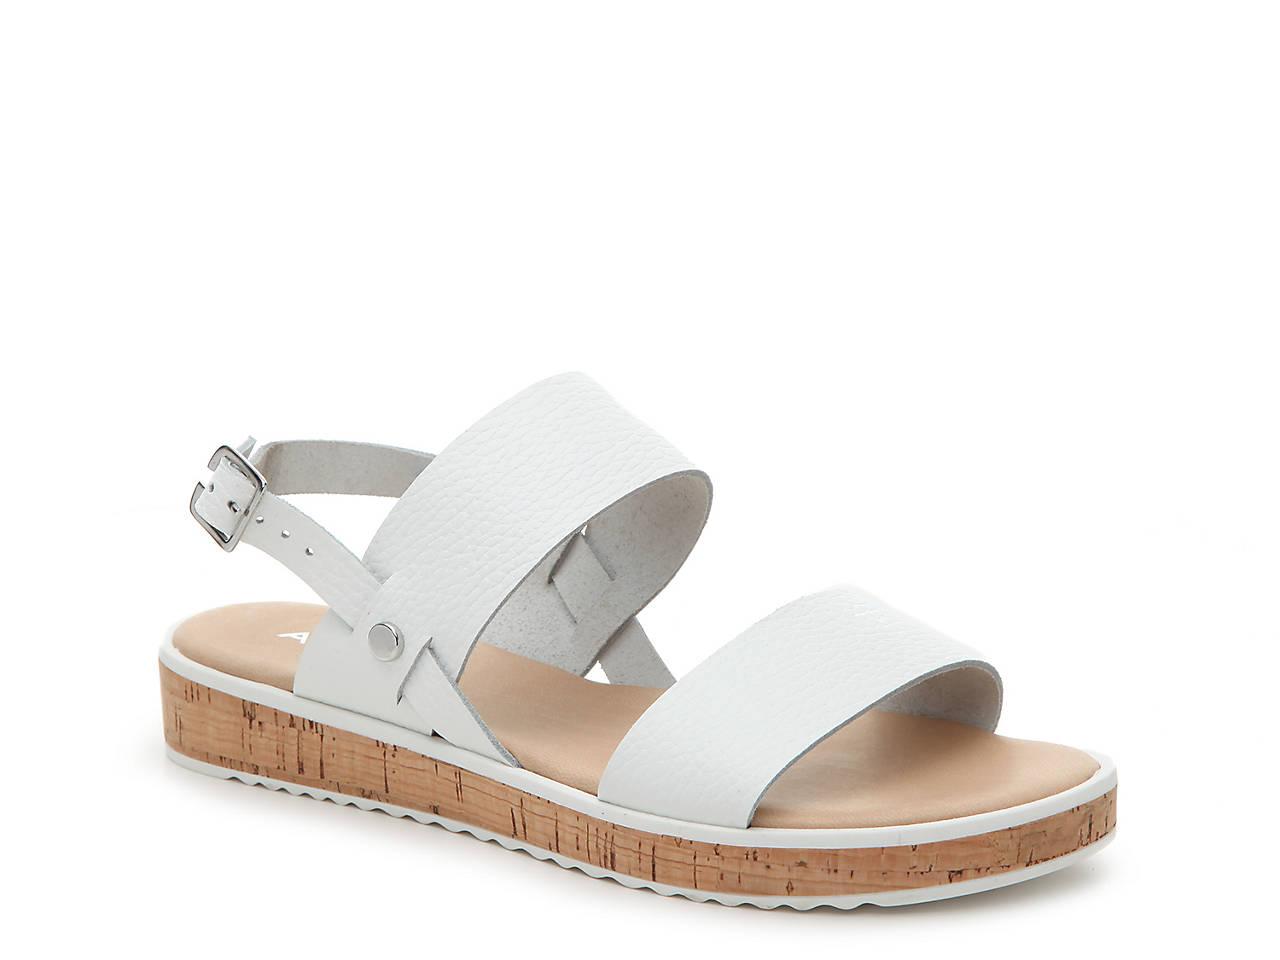 414c53456 Aldo Cirani Flat Sandal Women s Shoes